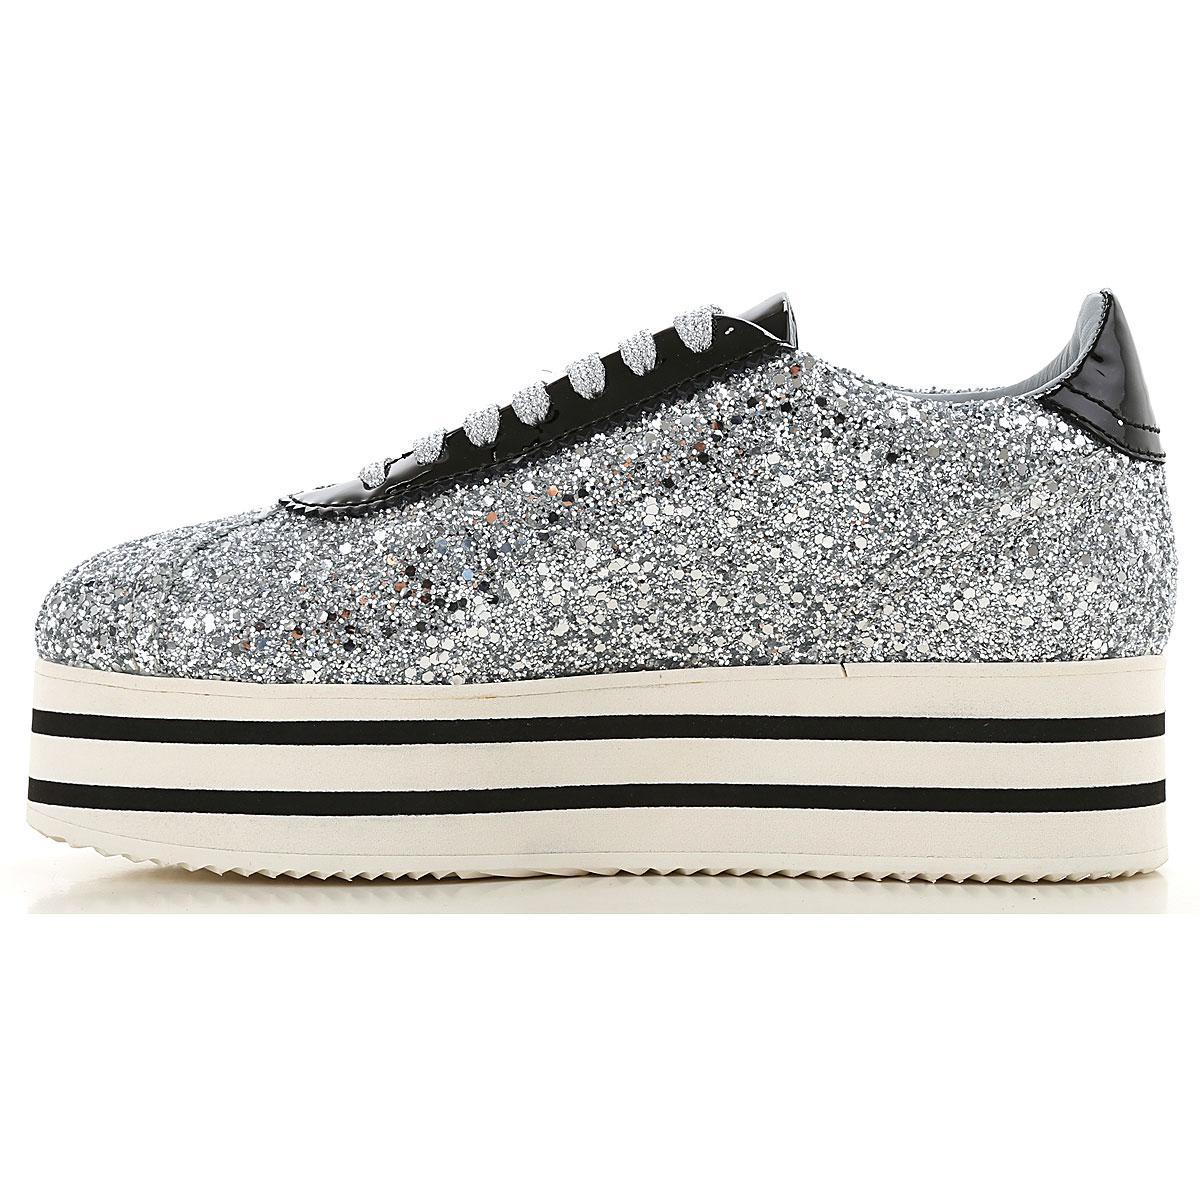 Chiara Ferragni Leather Silver Glittered Sneakers With Stars in Metallic - Save 28%